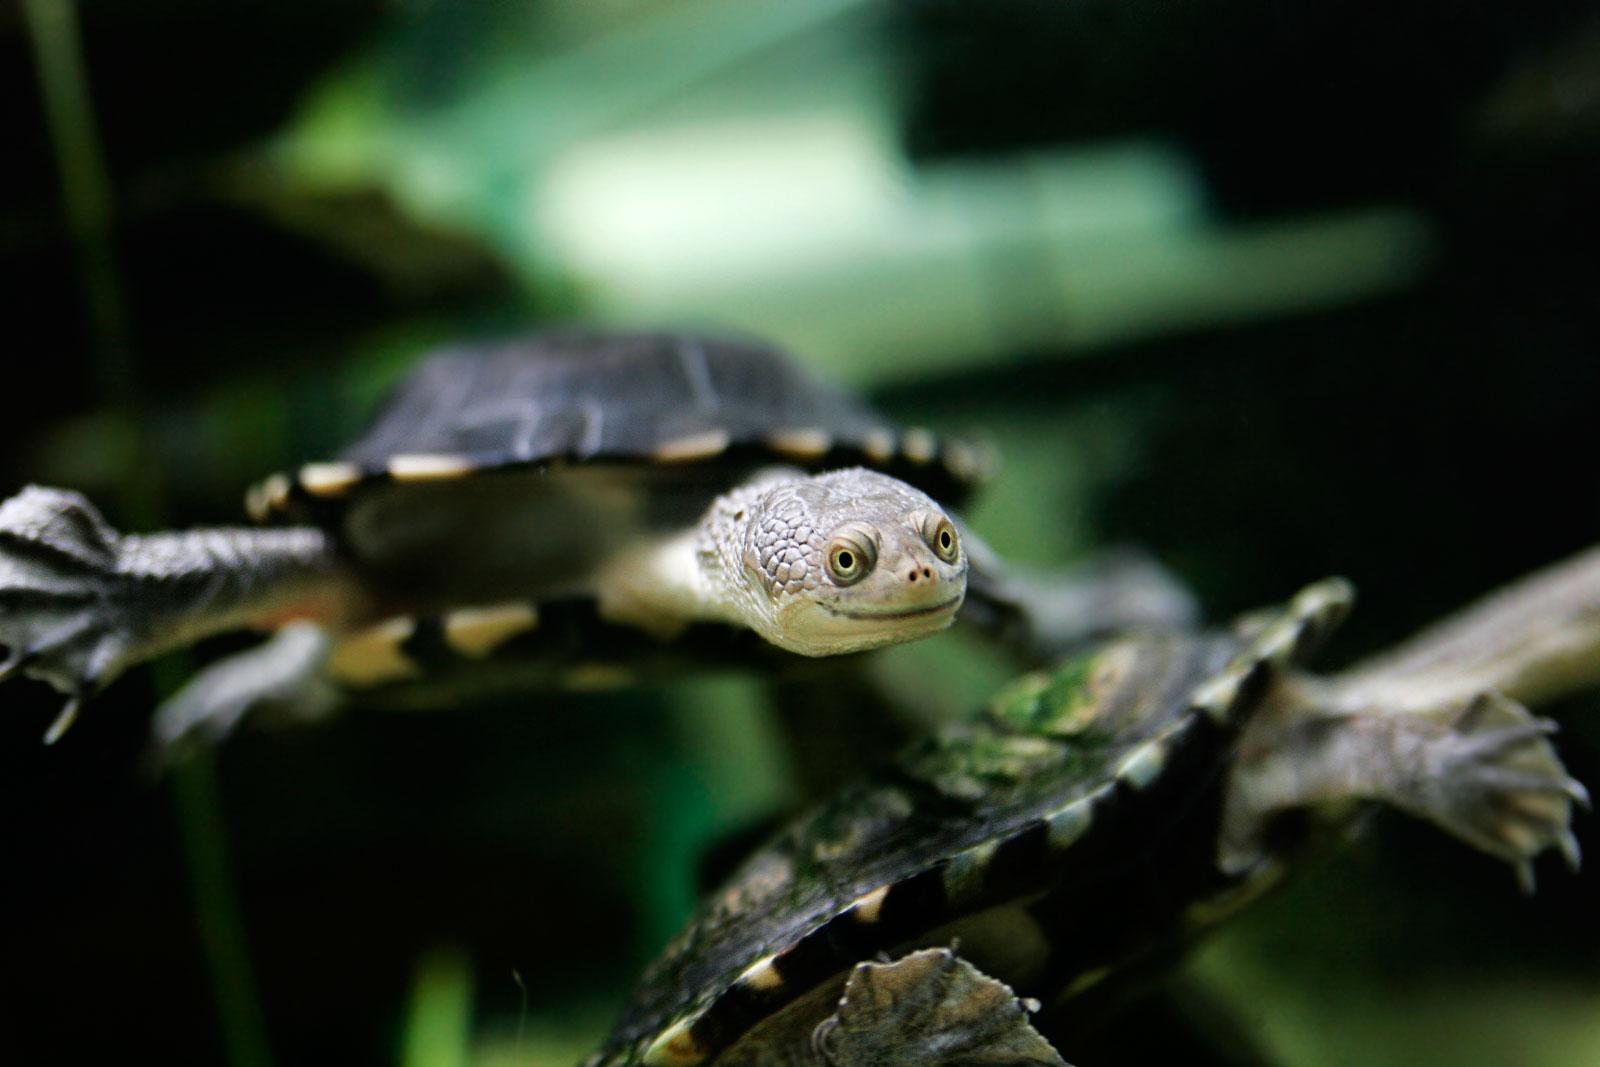 https://upload.wikimedia.org/wikipedia/commons/e/ec/Eastern_long_neck_tortoise_-_chelodina_longicollis.jpg